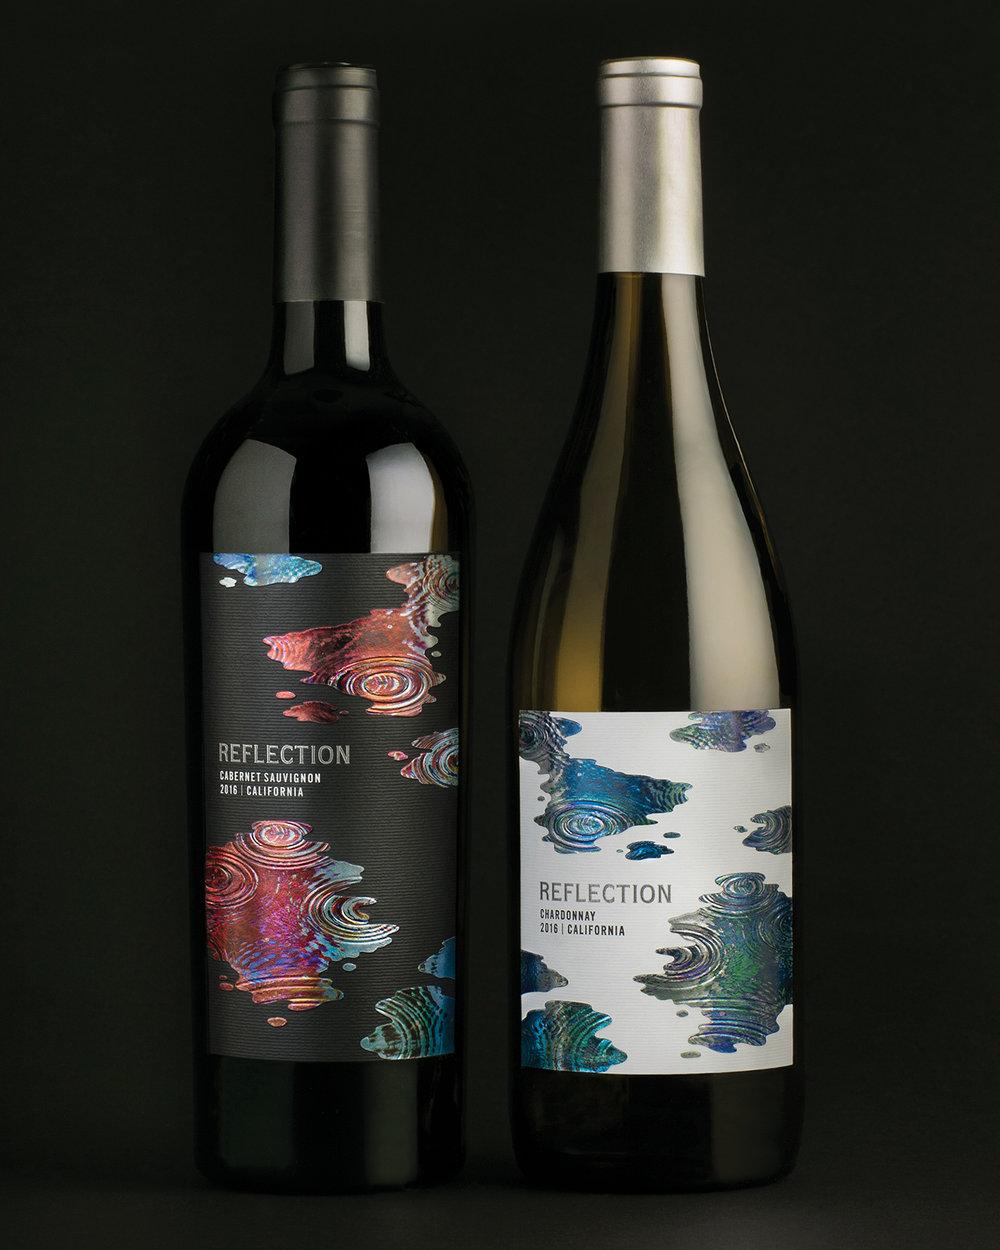 reflection_wine_label_sterling_creativeworks.jpg